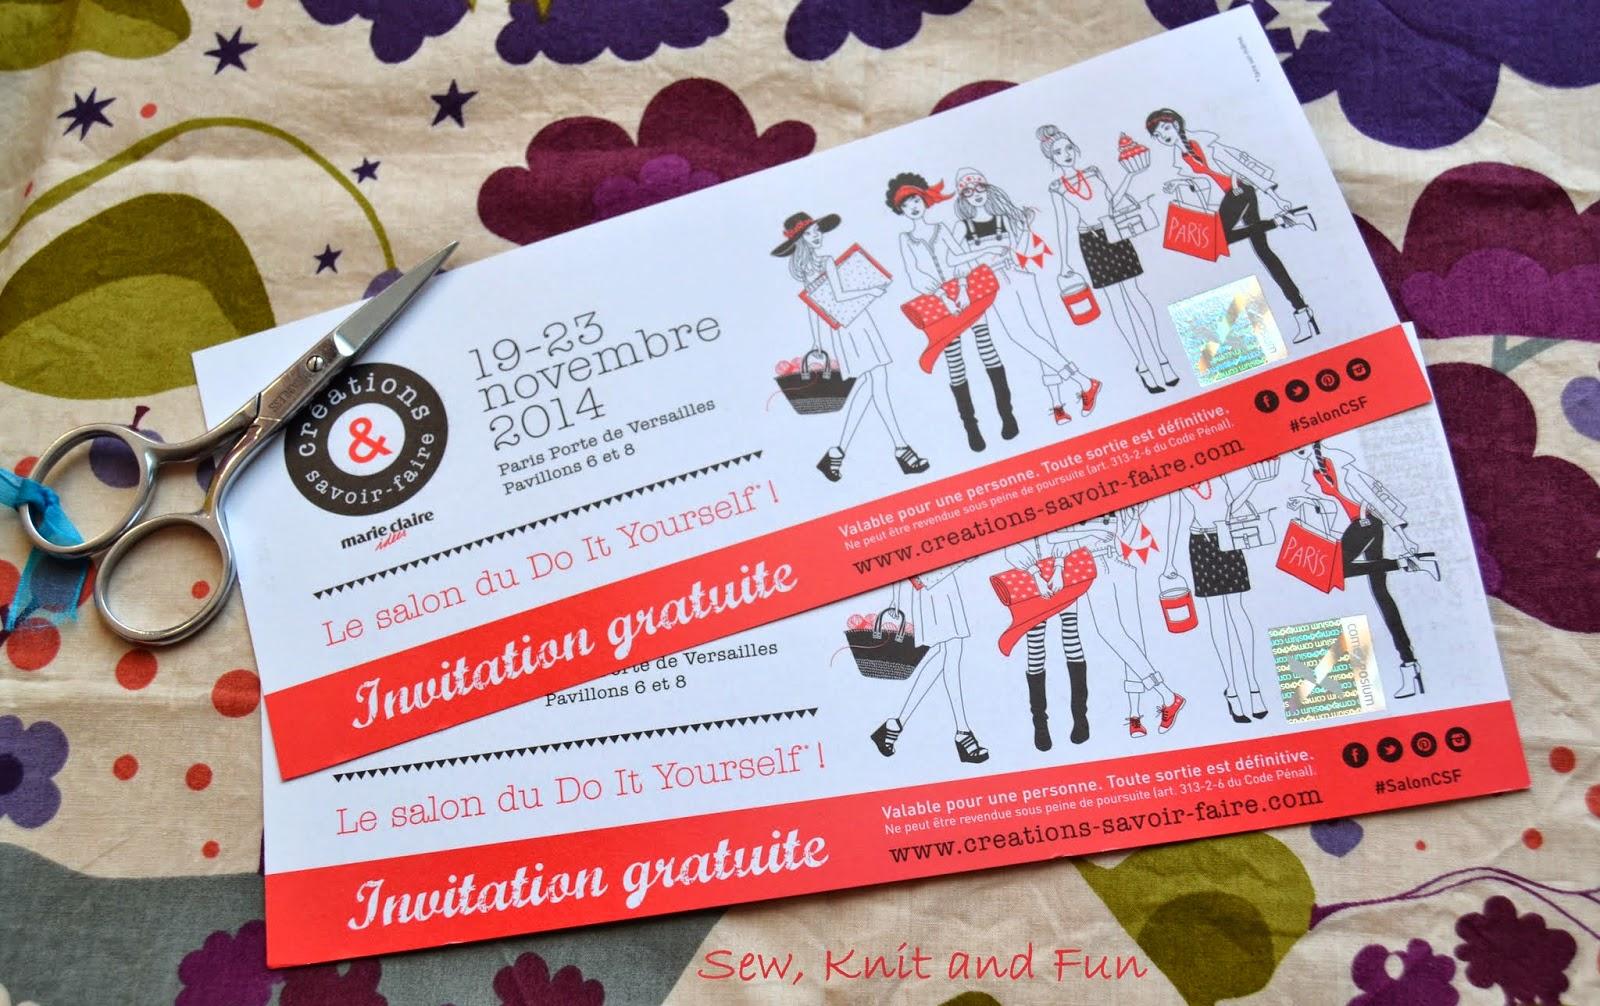 Sew knit and fun 2 invitations pour cr ations et savoir - Salon creations savoir faire invitation ...